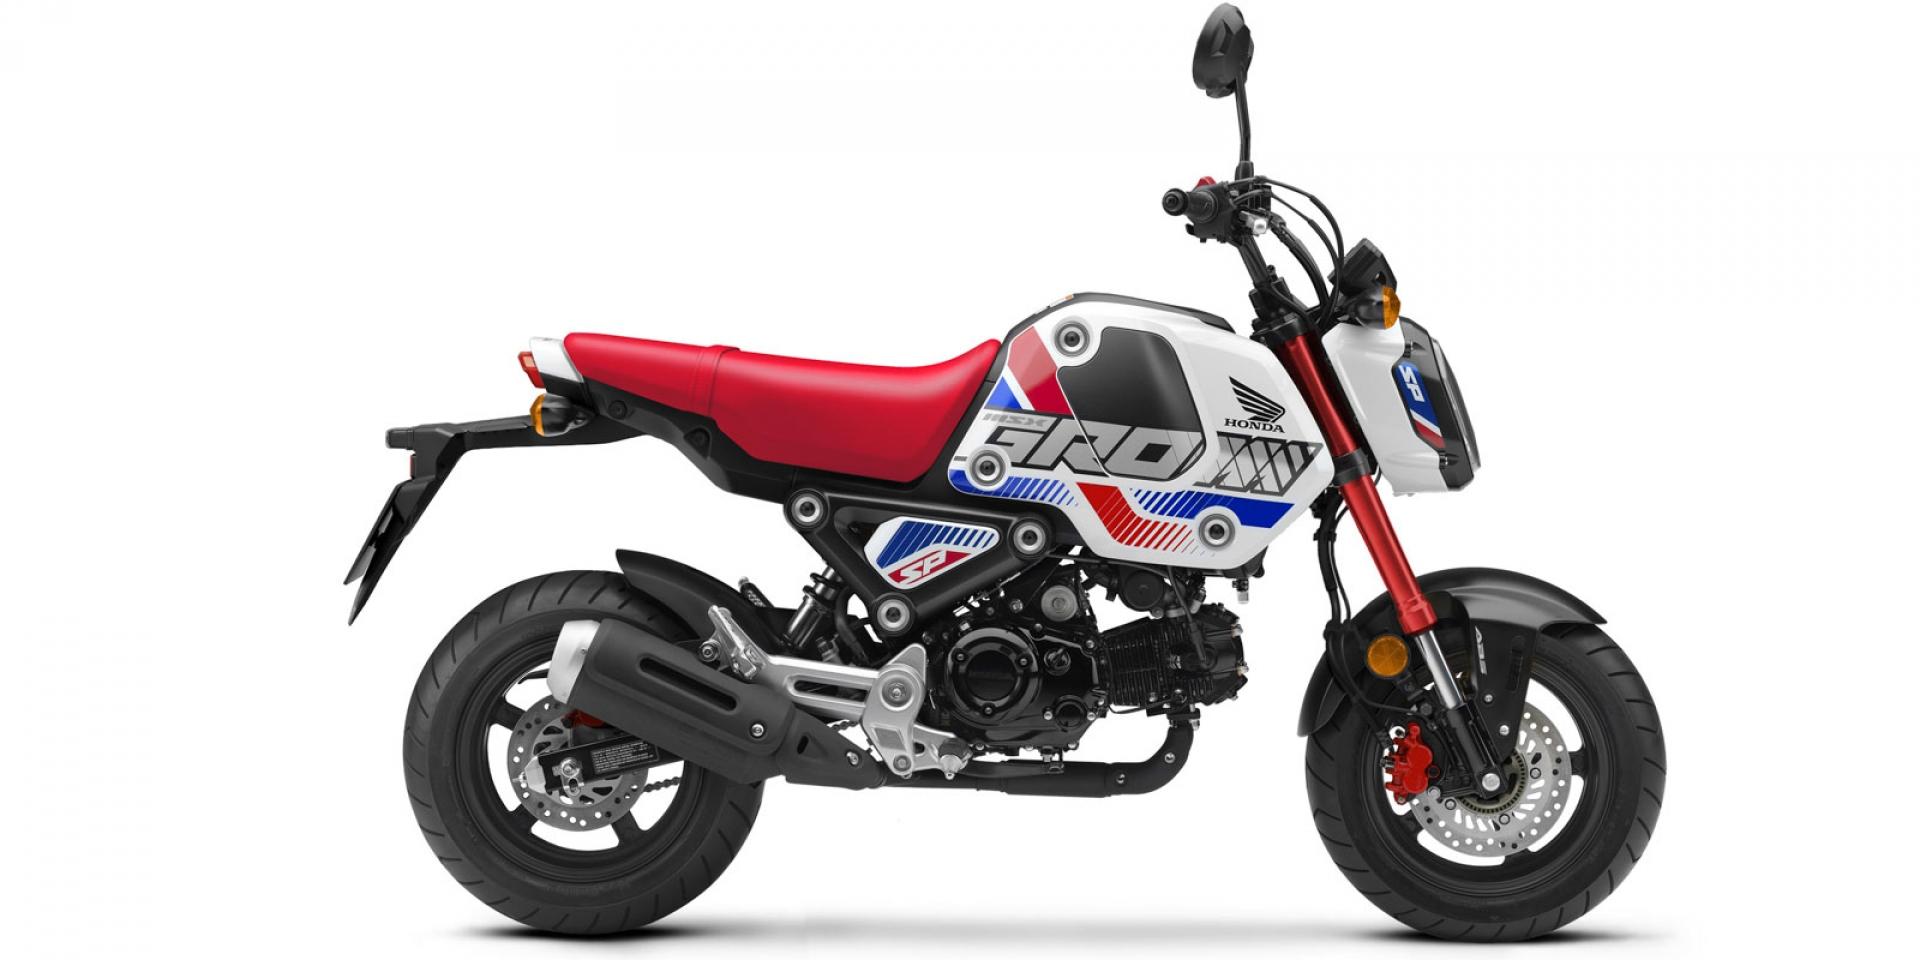 Honda Motorcycle 2021 2021 Honda二輪全車系正式售價發表  暨 MSX GROM全新進化 樂趣登場